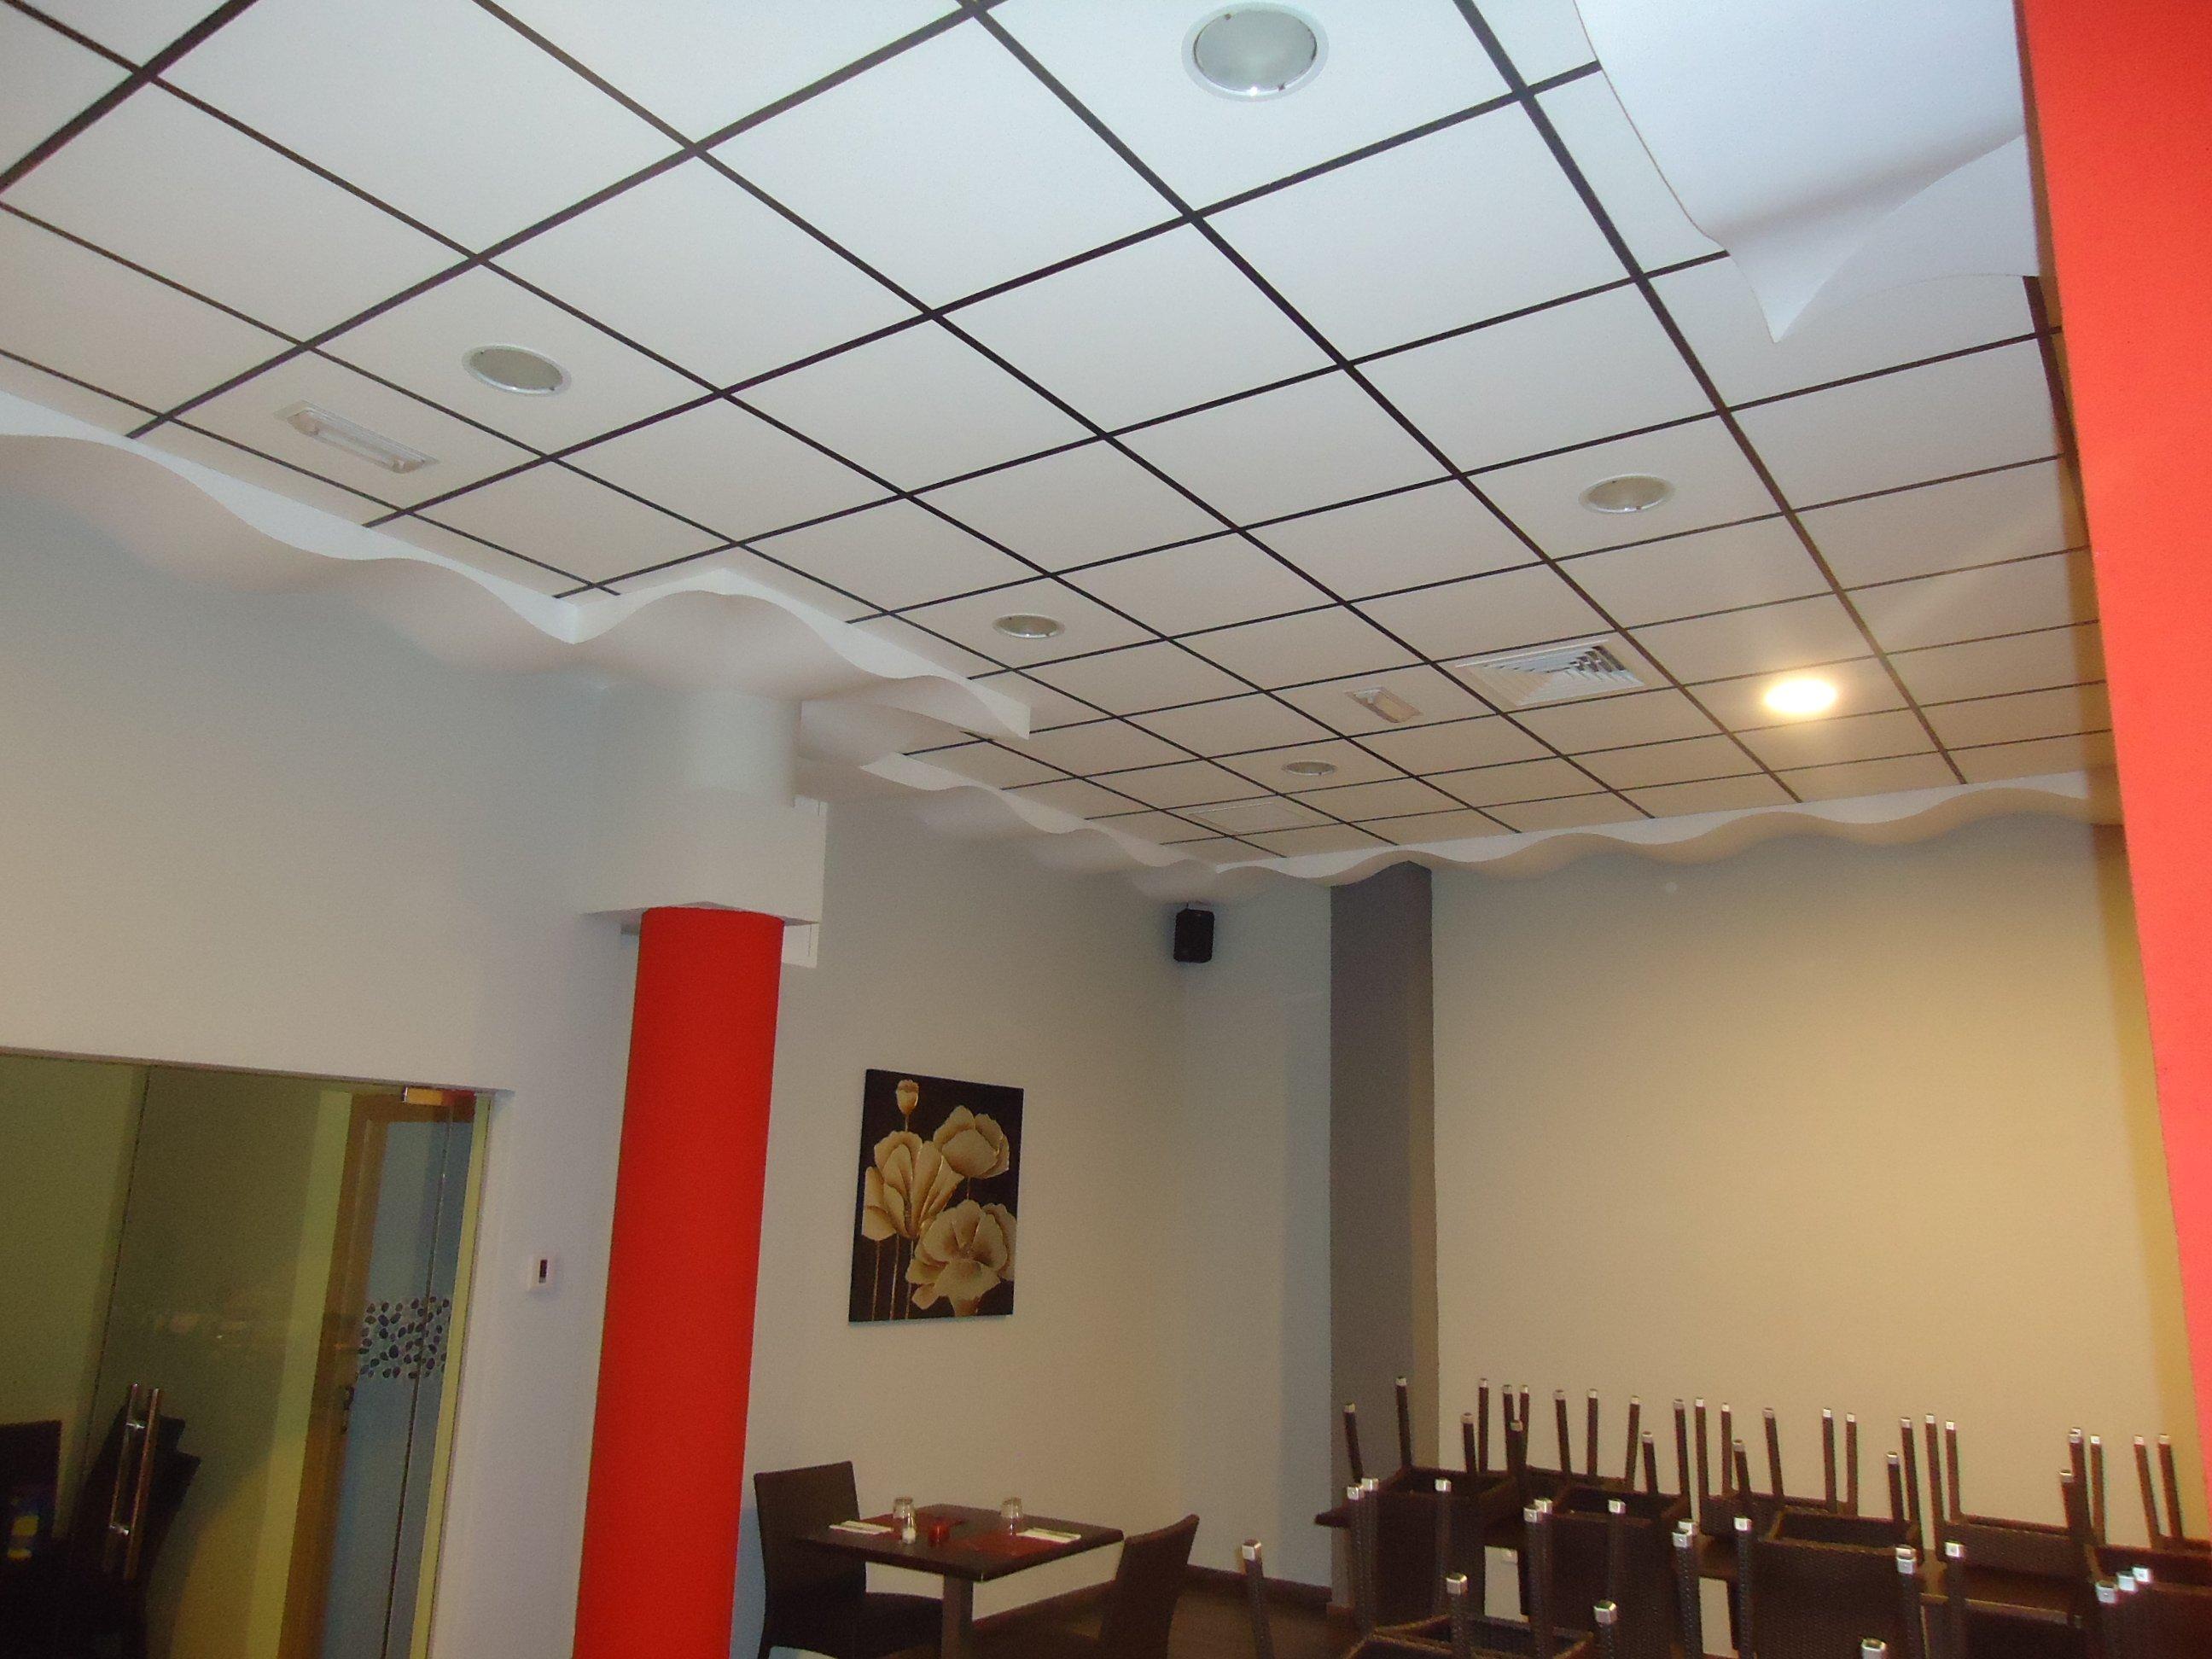 Falsos techos prefinsa for Techo desmontable escayola